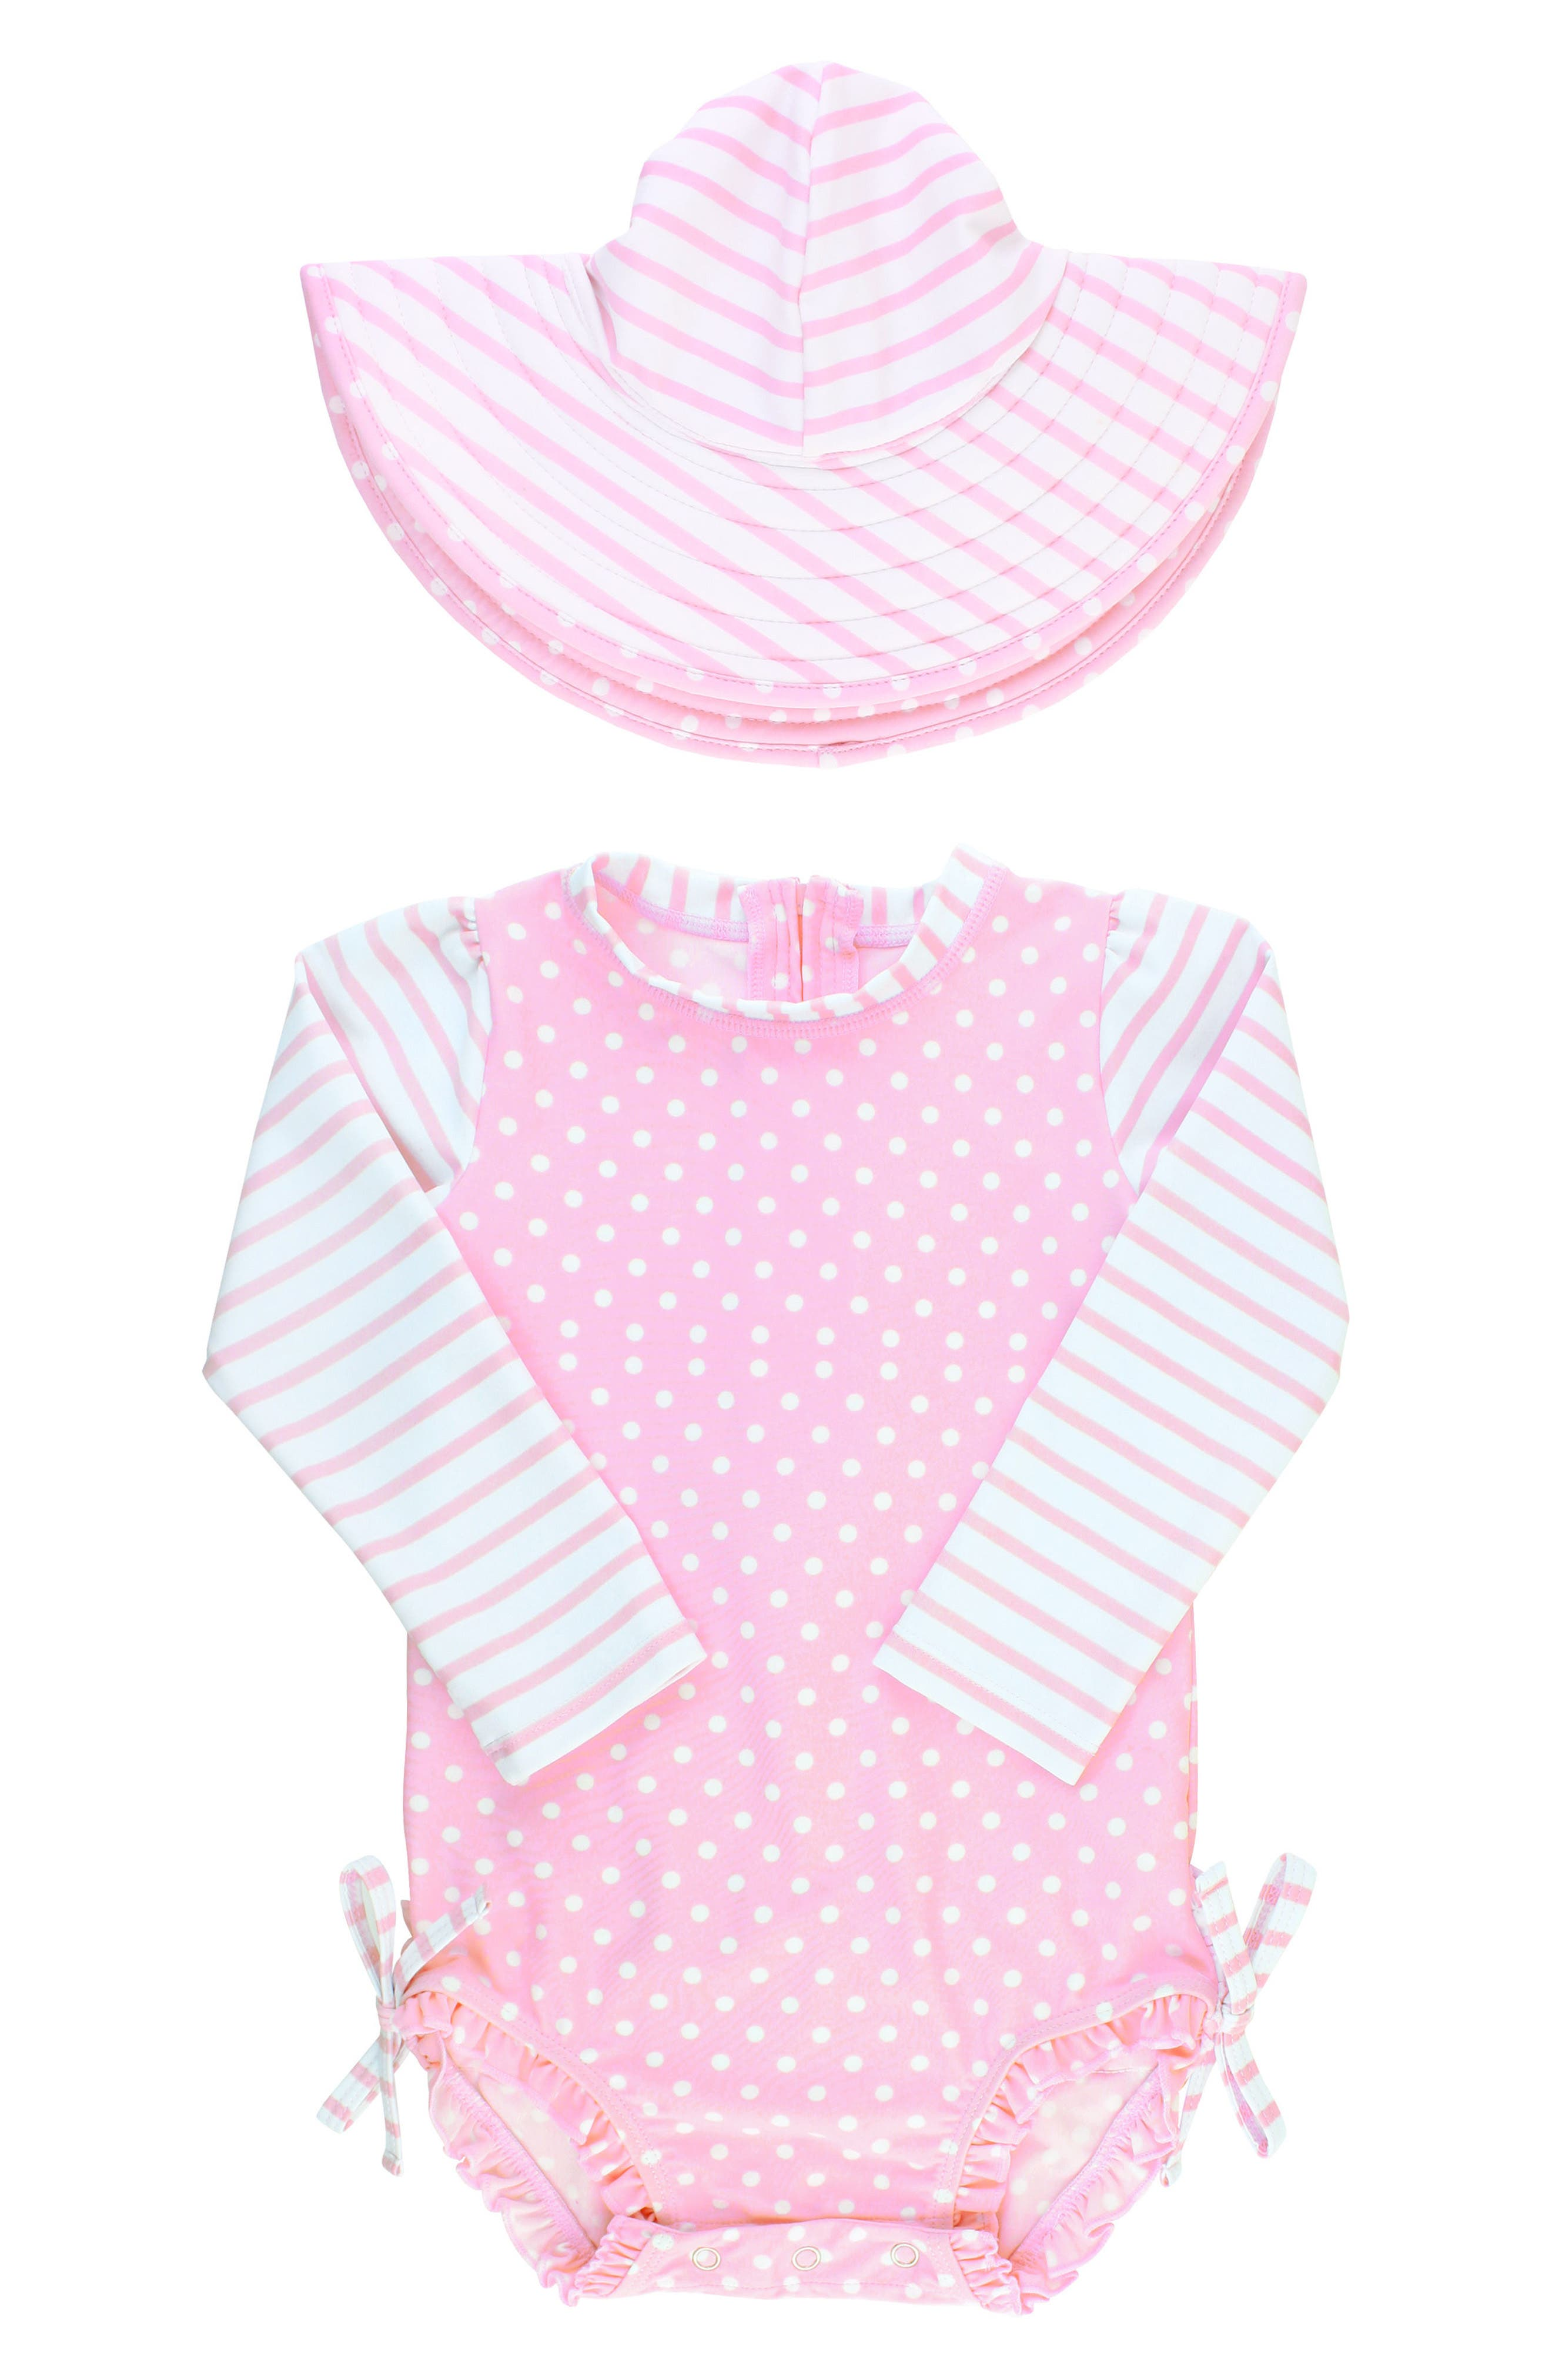 Ruffle Butts Polka Dot One-Piece Rashguard Swimsuit & Sun Hat Set,                             Main thumbnail 1, color,                             PINK